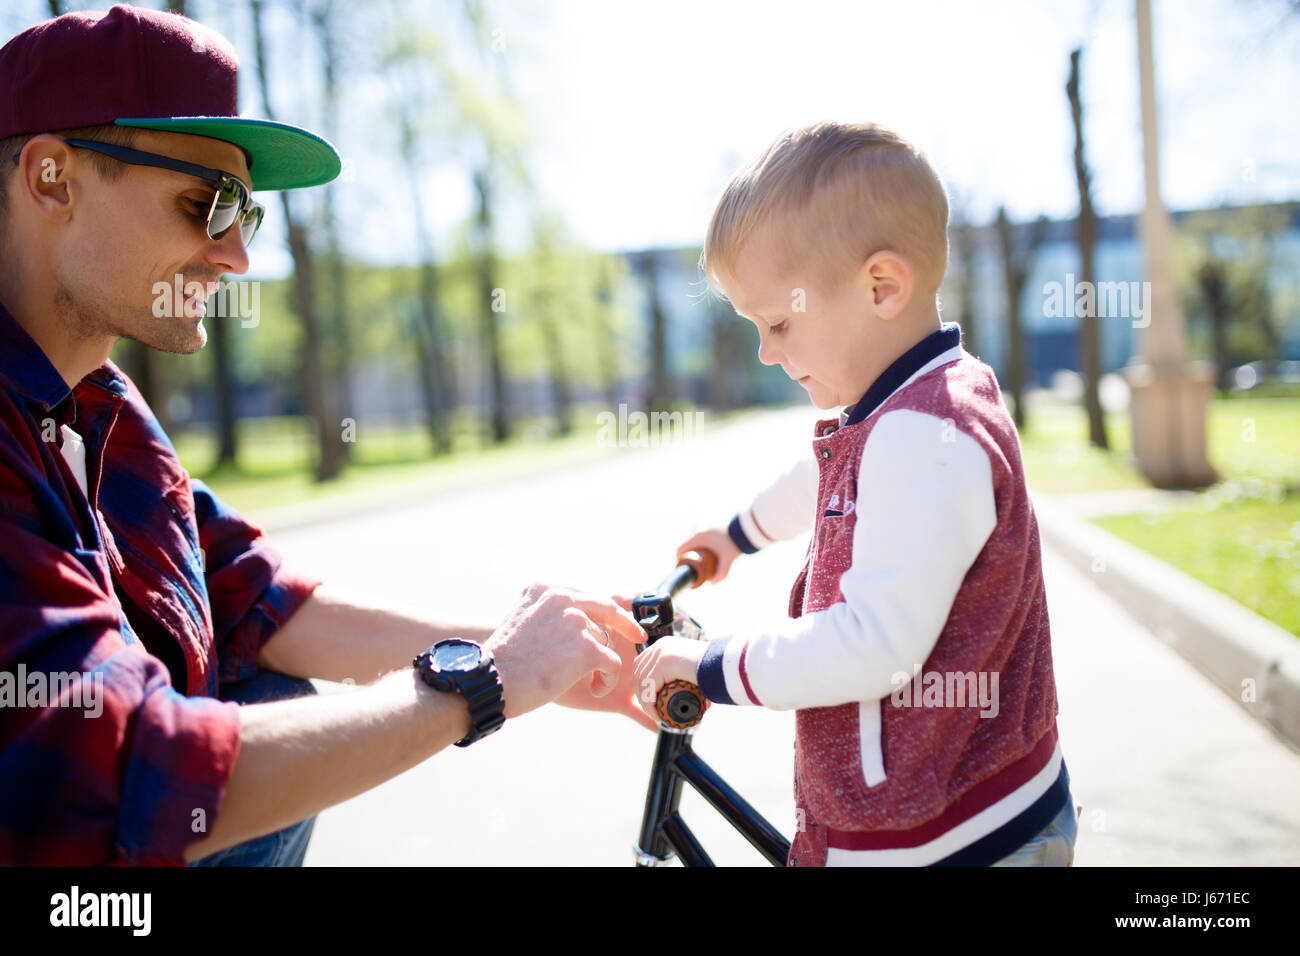 Dad ,son on bike ride - Stock Image